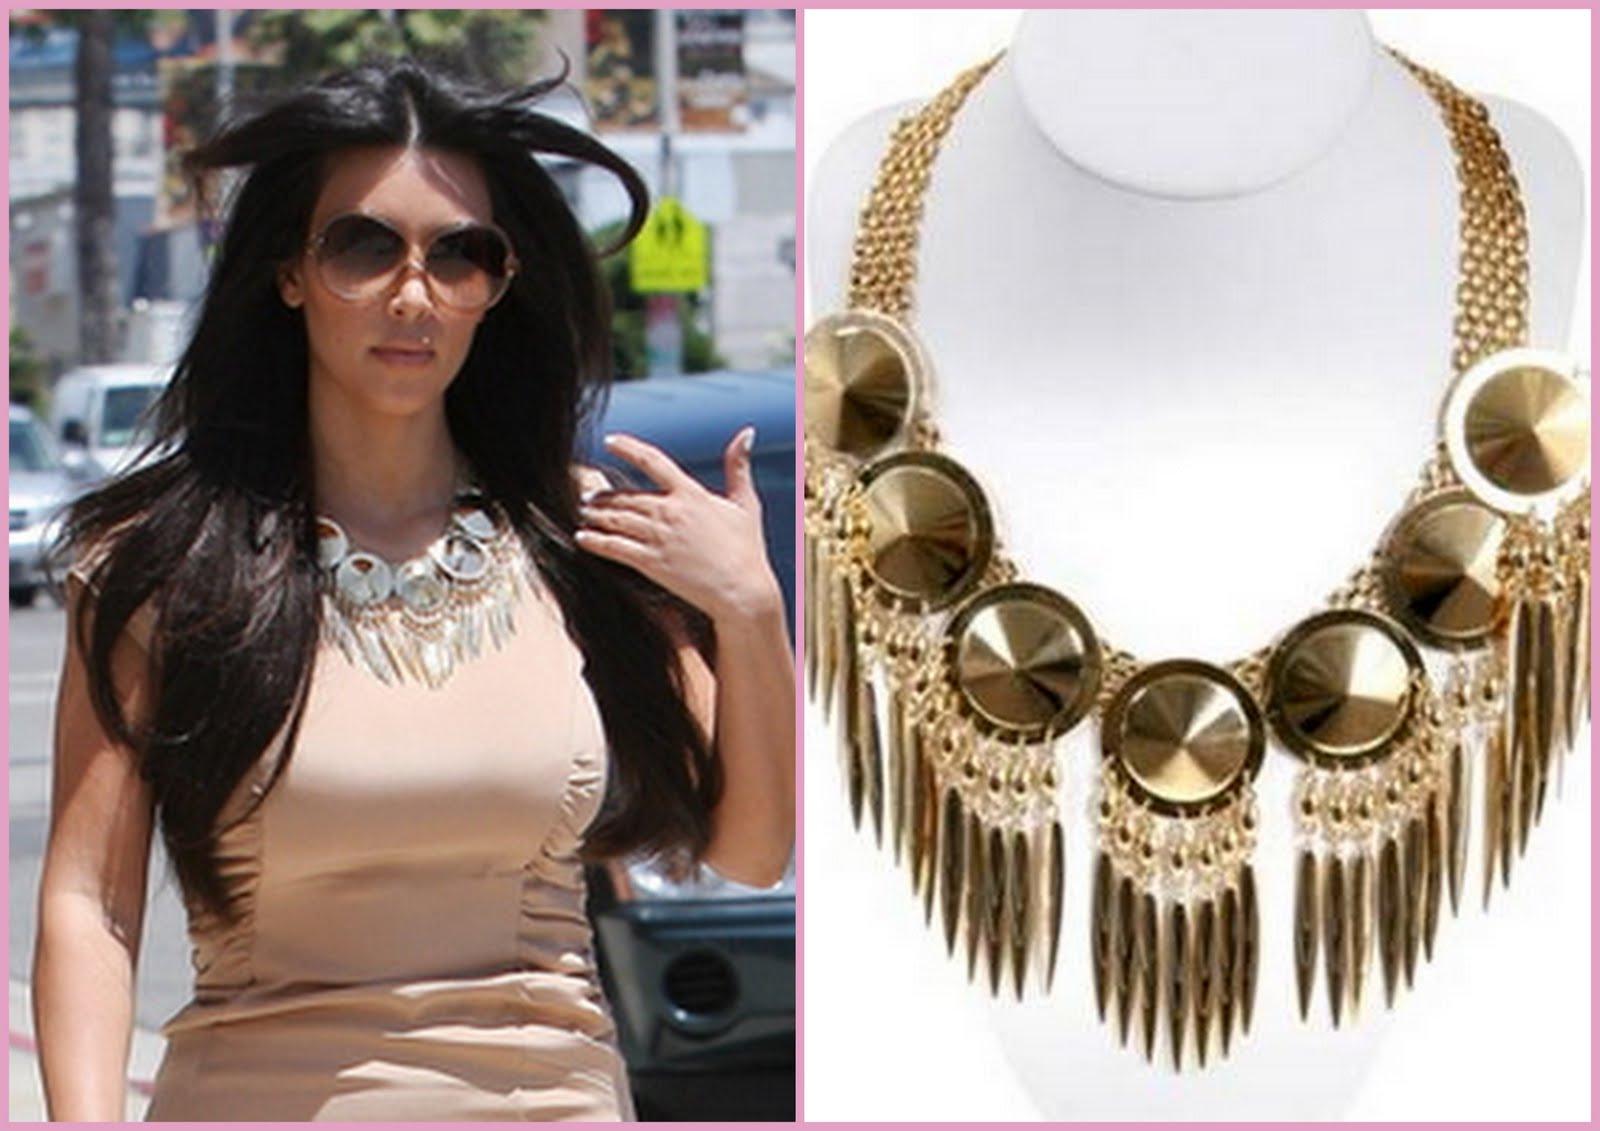 http://3.bp.blogspot.com/-8cbancp5VT8/TtEP_5CrfUI/AAAAAAAADoY/0npAE1KUyOI/s1600/kim_k_dagger_necklace.jpg